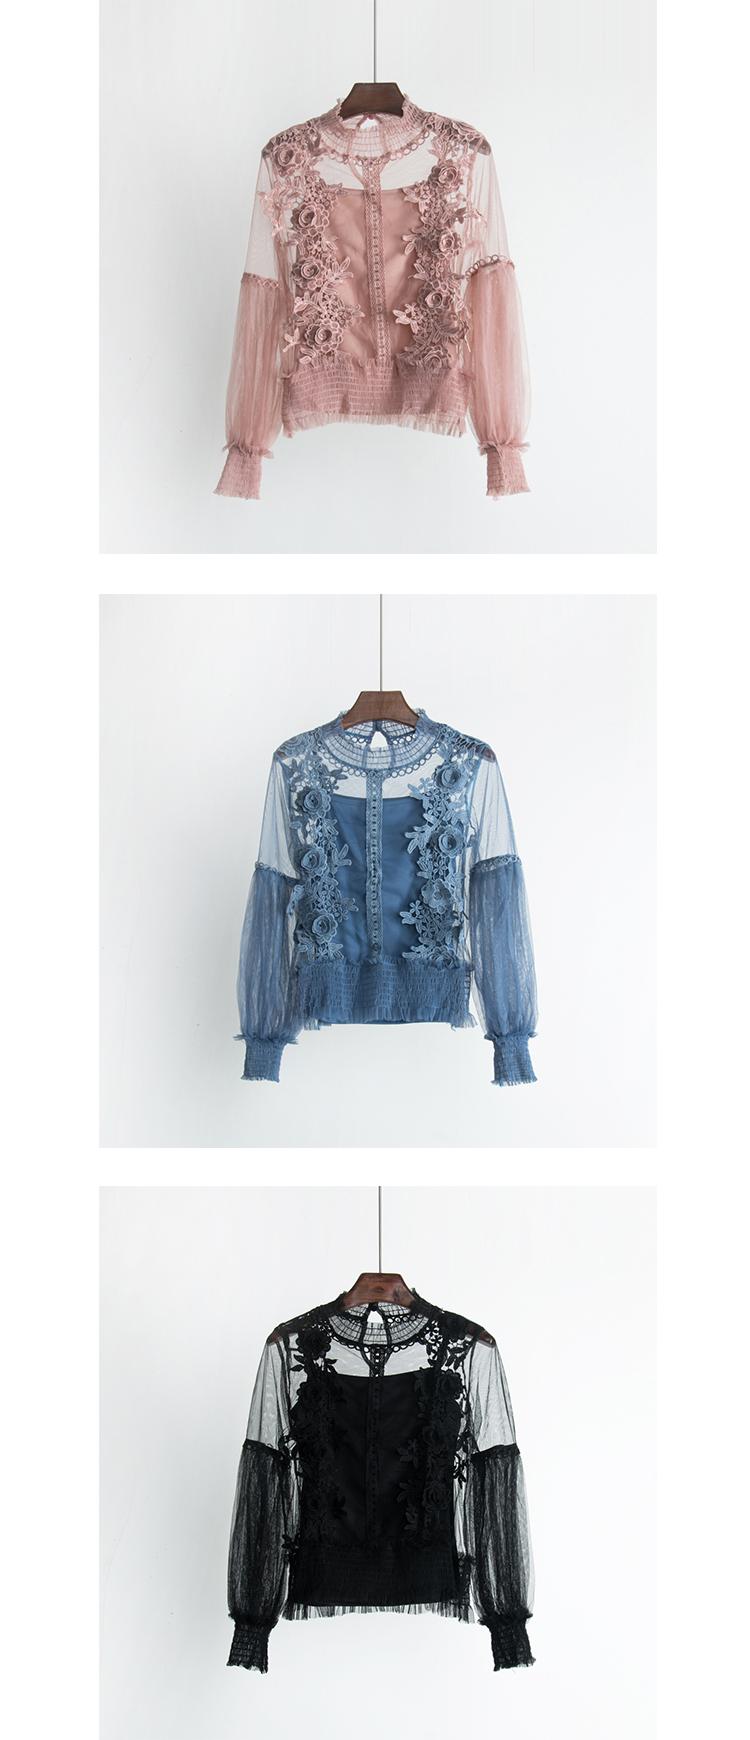 2018 Sweet Long Lantern Sleeve Transparent Hollow Out Mesh Blouses Women Two Pcs Set 3D Flower Mesh Shirts Sweet Flower Mesh Top 9